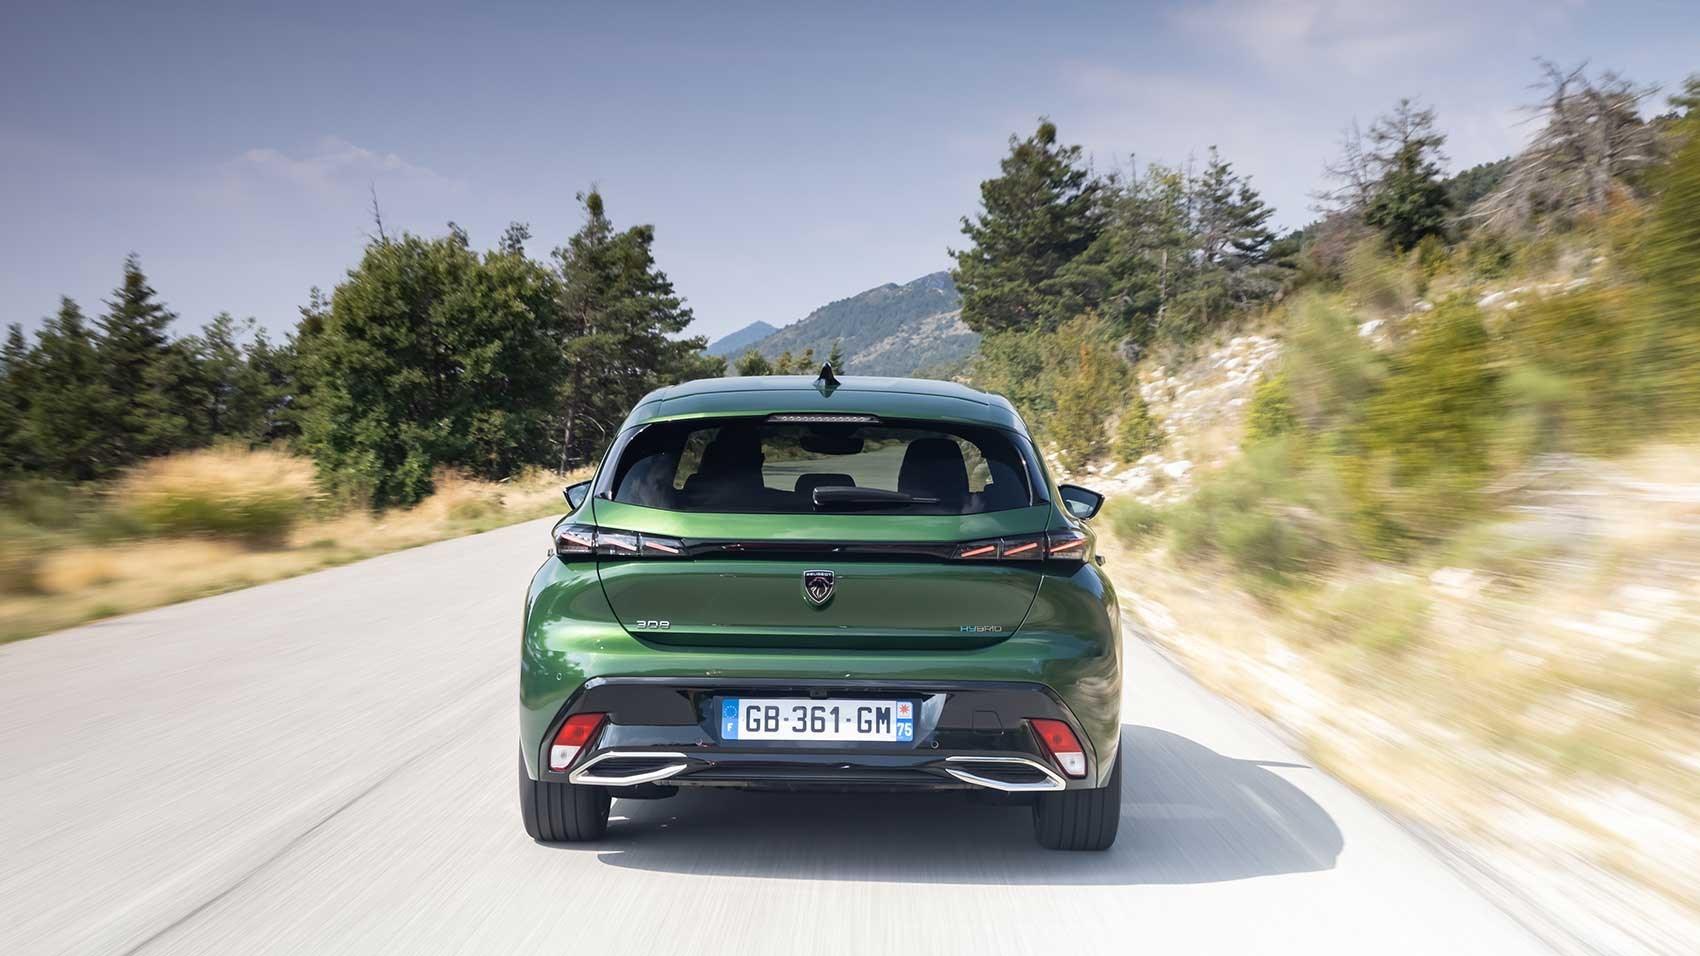 Peugeot 308 rear driving shot